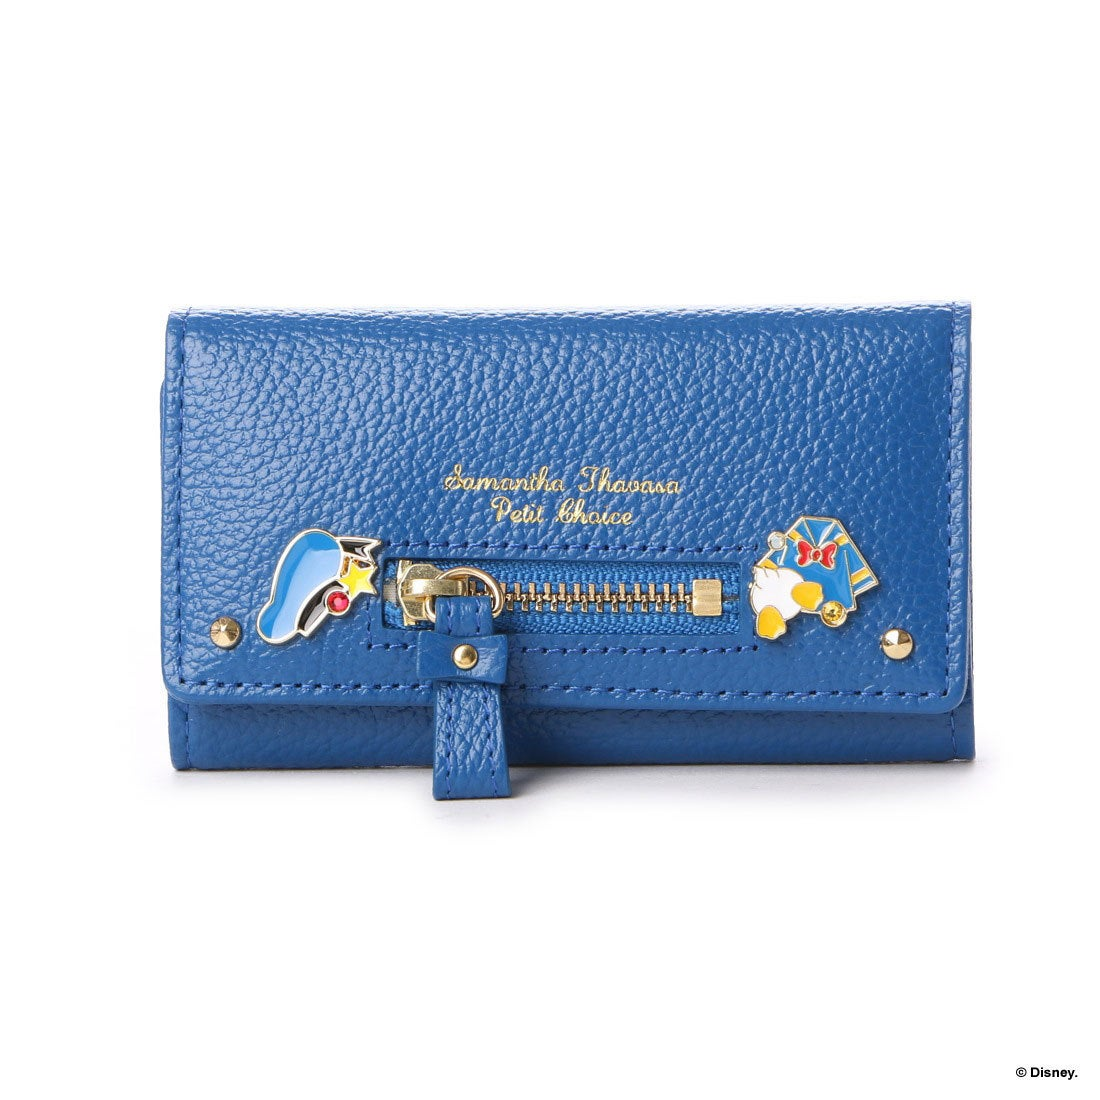 45803f6ff132 Samantha Thavasa サマンサタバサプチチョイス ディズニーコレクション「ミッキーマウス&ミニーマウス」「ドナルドダック&デイジーダック」  キーケース(ドナルド ...